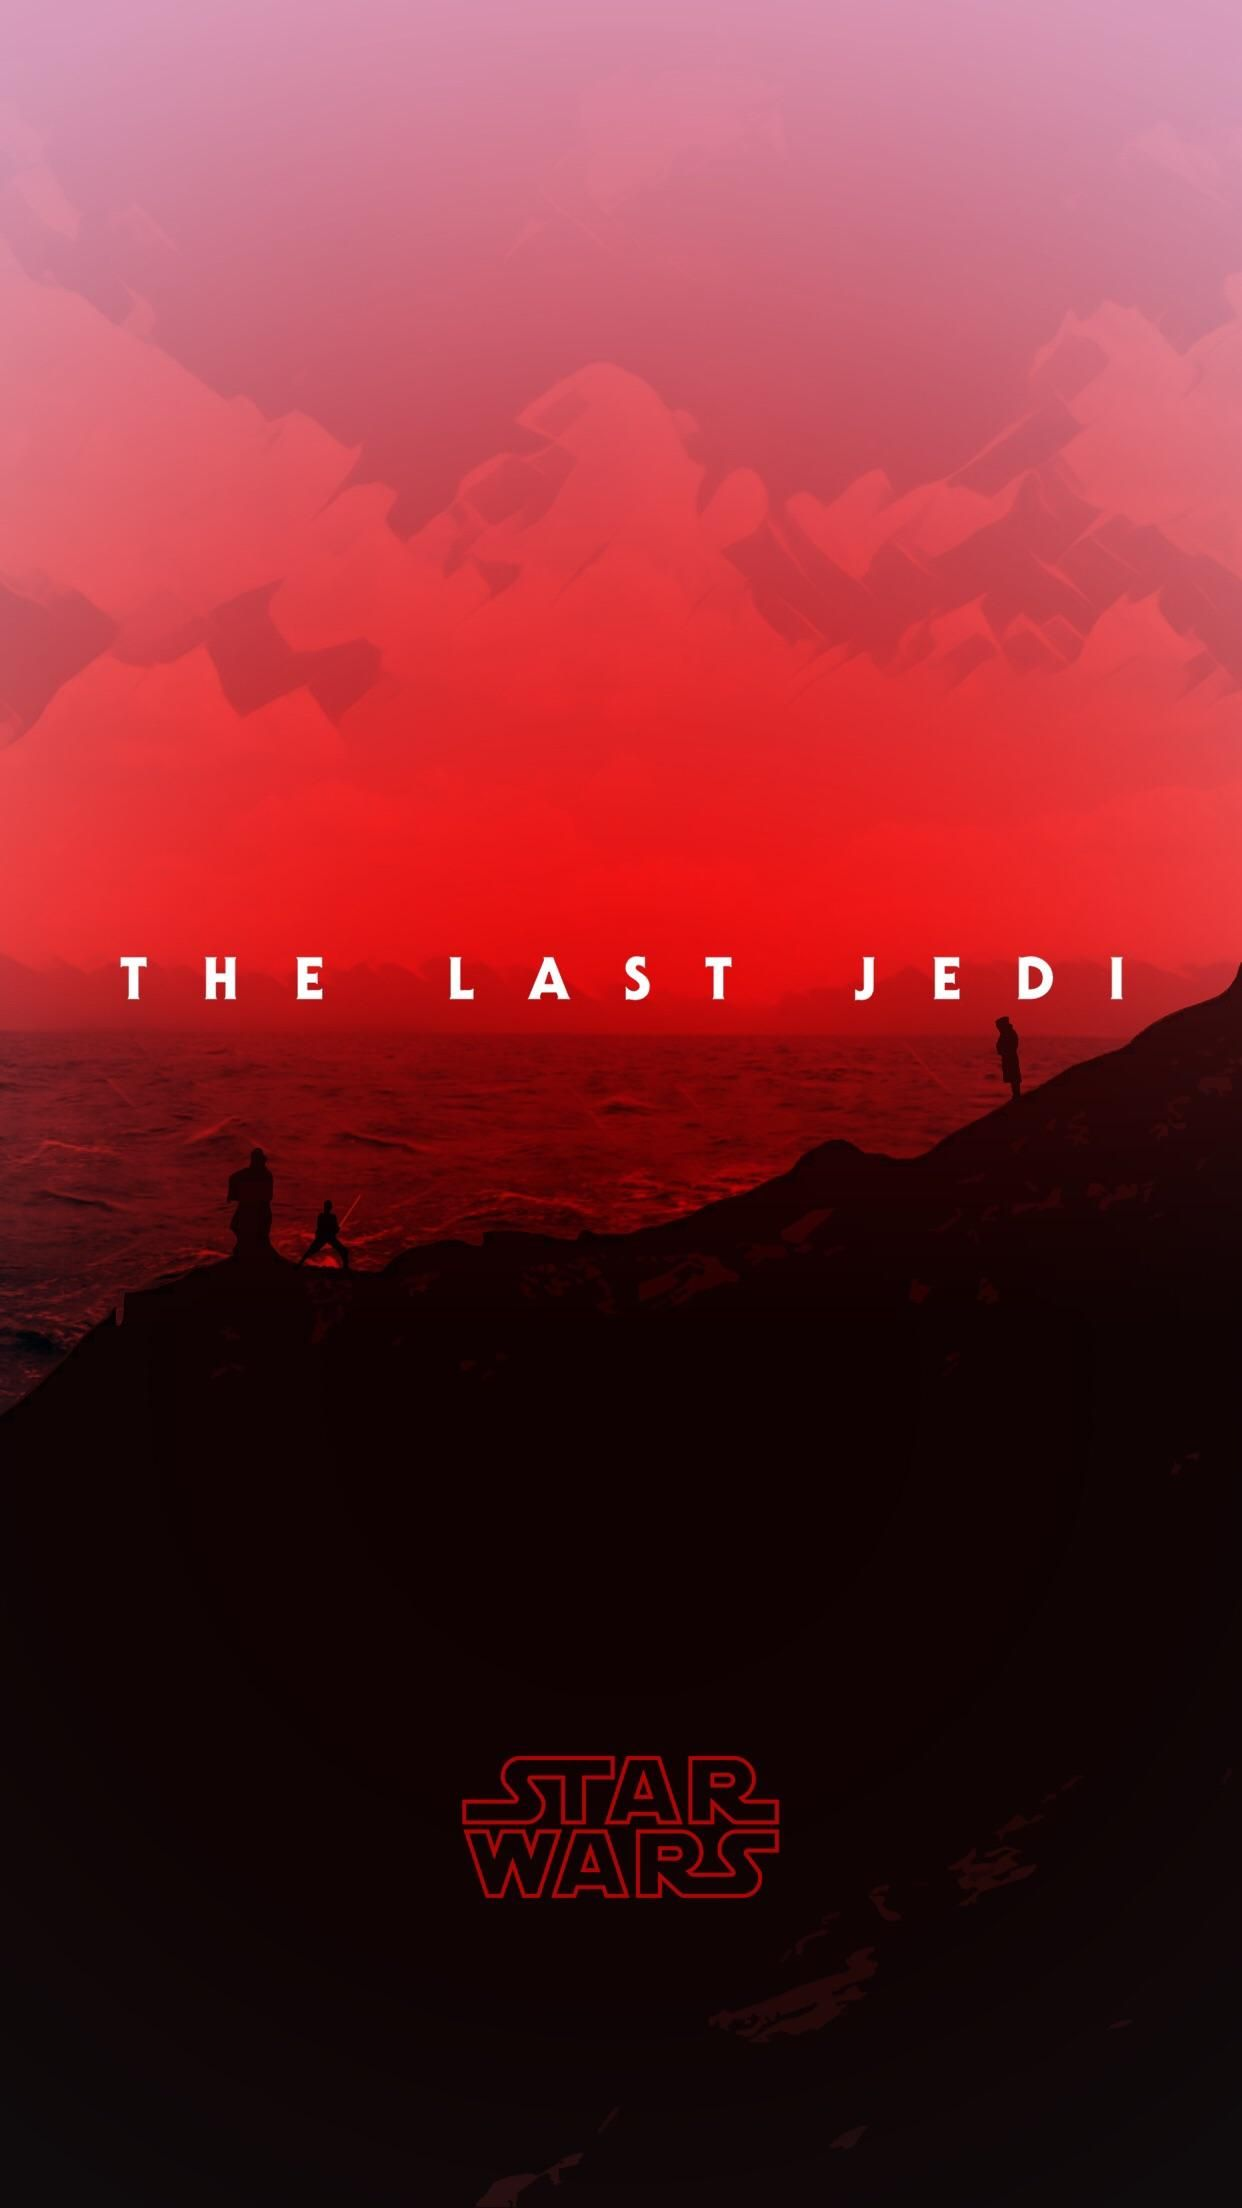 Star Wars The Last Jedi 2017 HD Wallpaper From Gallsource